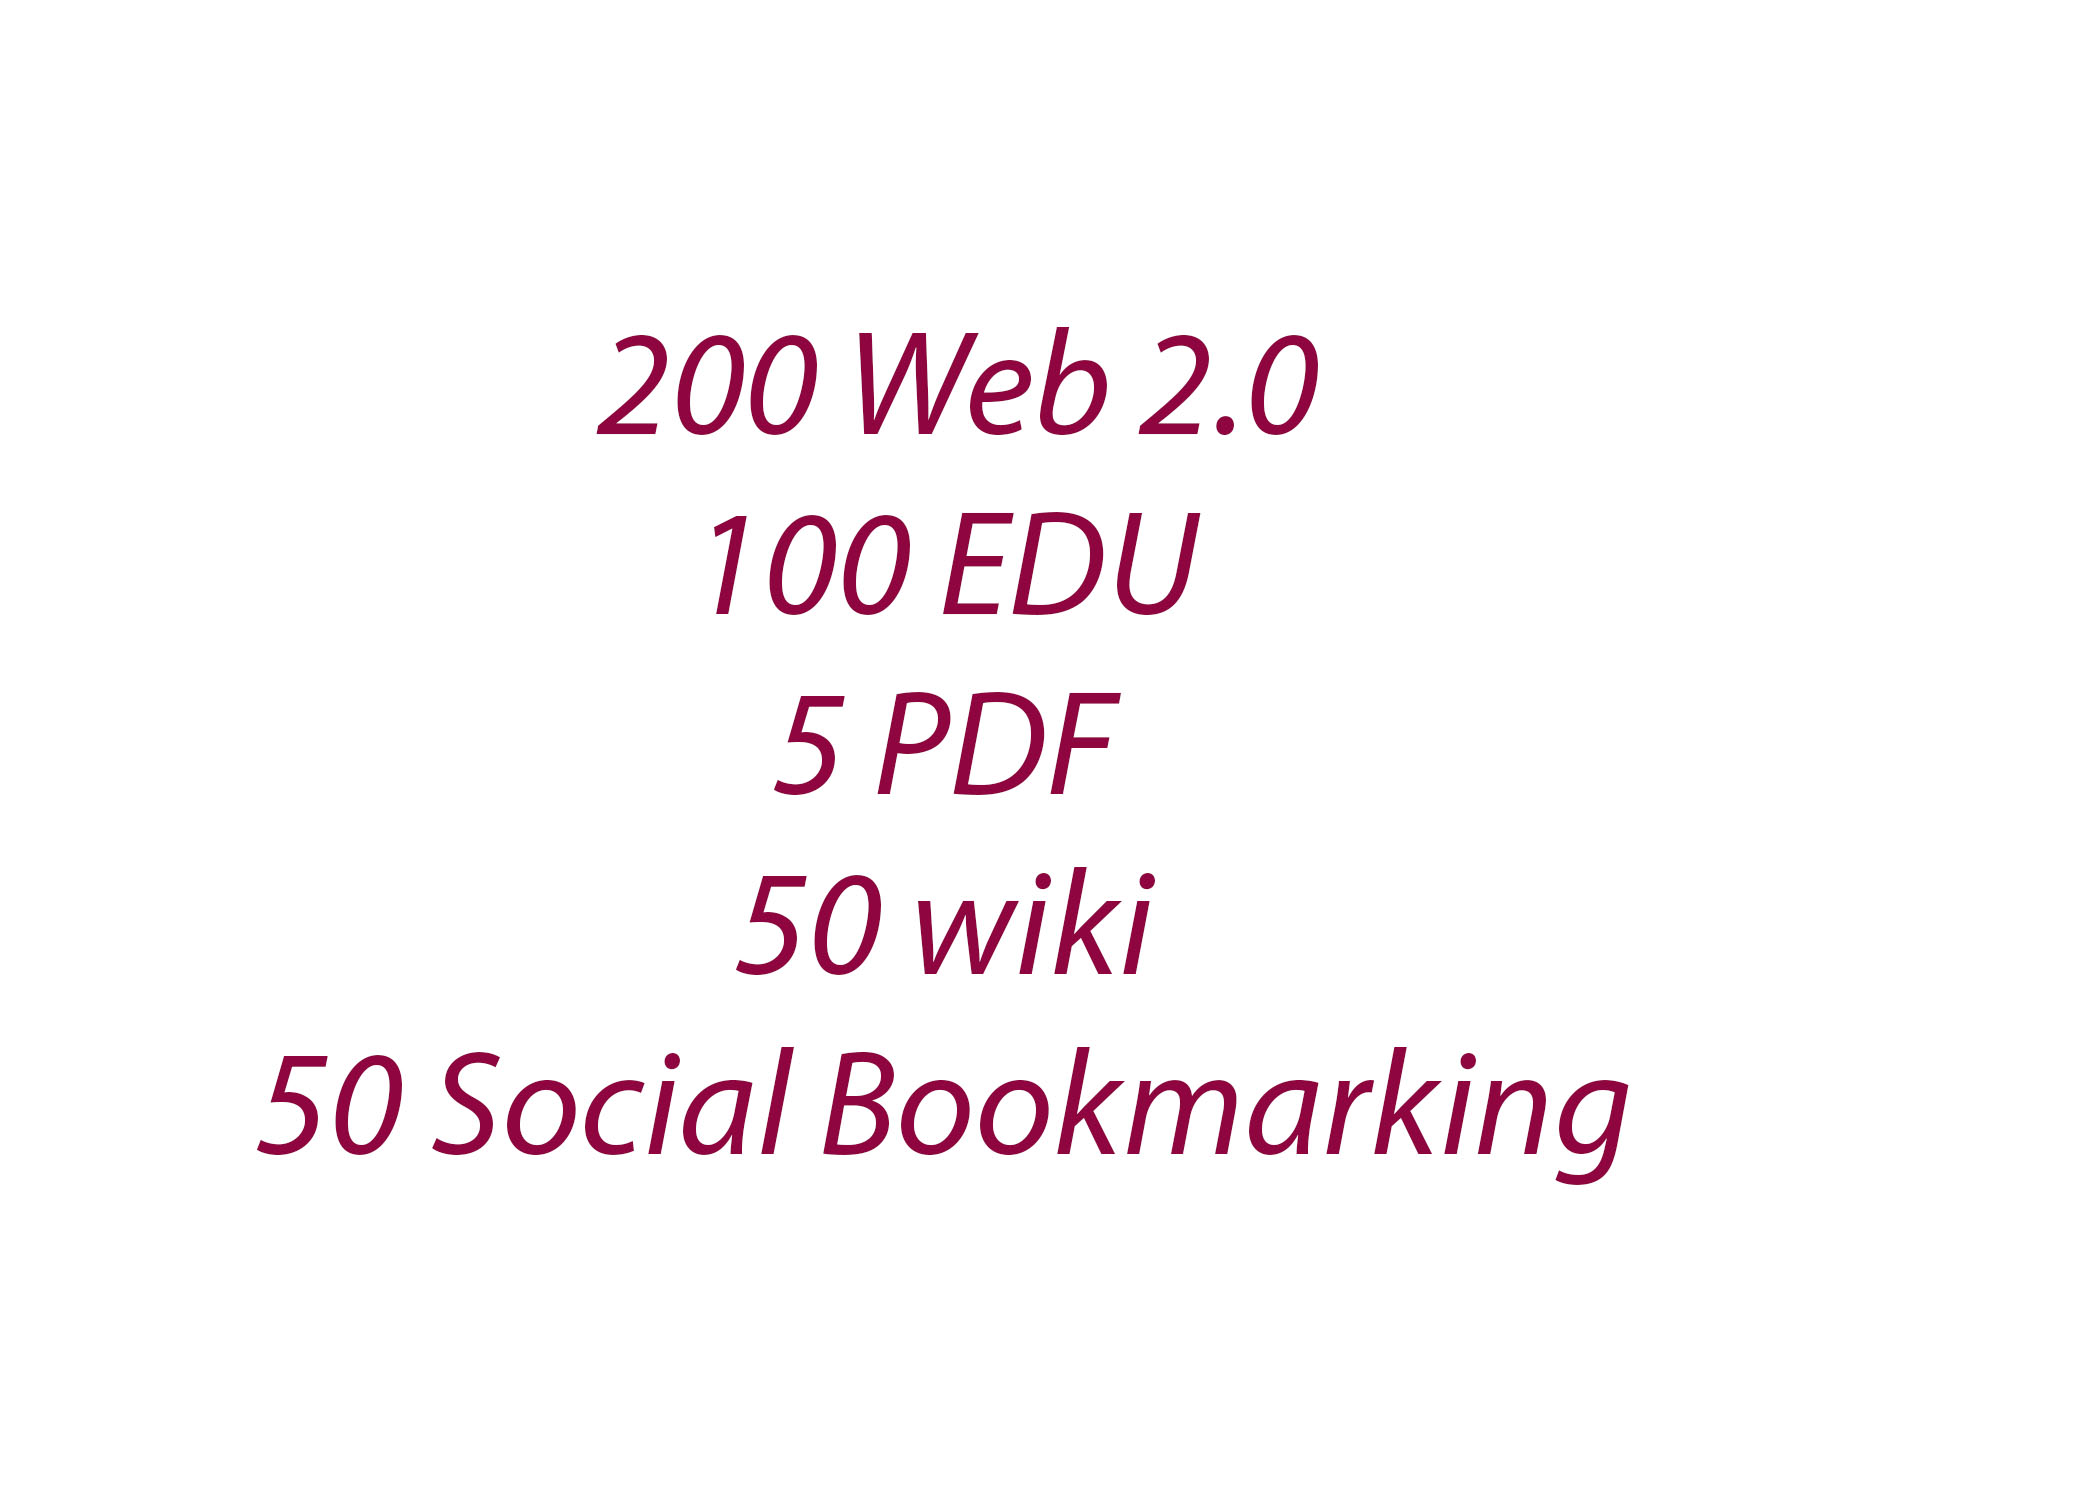 200 Web 2.0 + 20 EDU/GOV + 5 PDF + 50 wiki + 50 social bookmarking